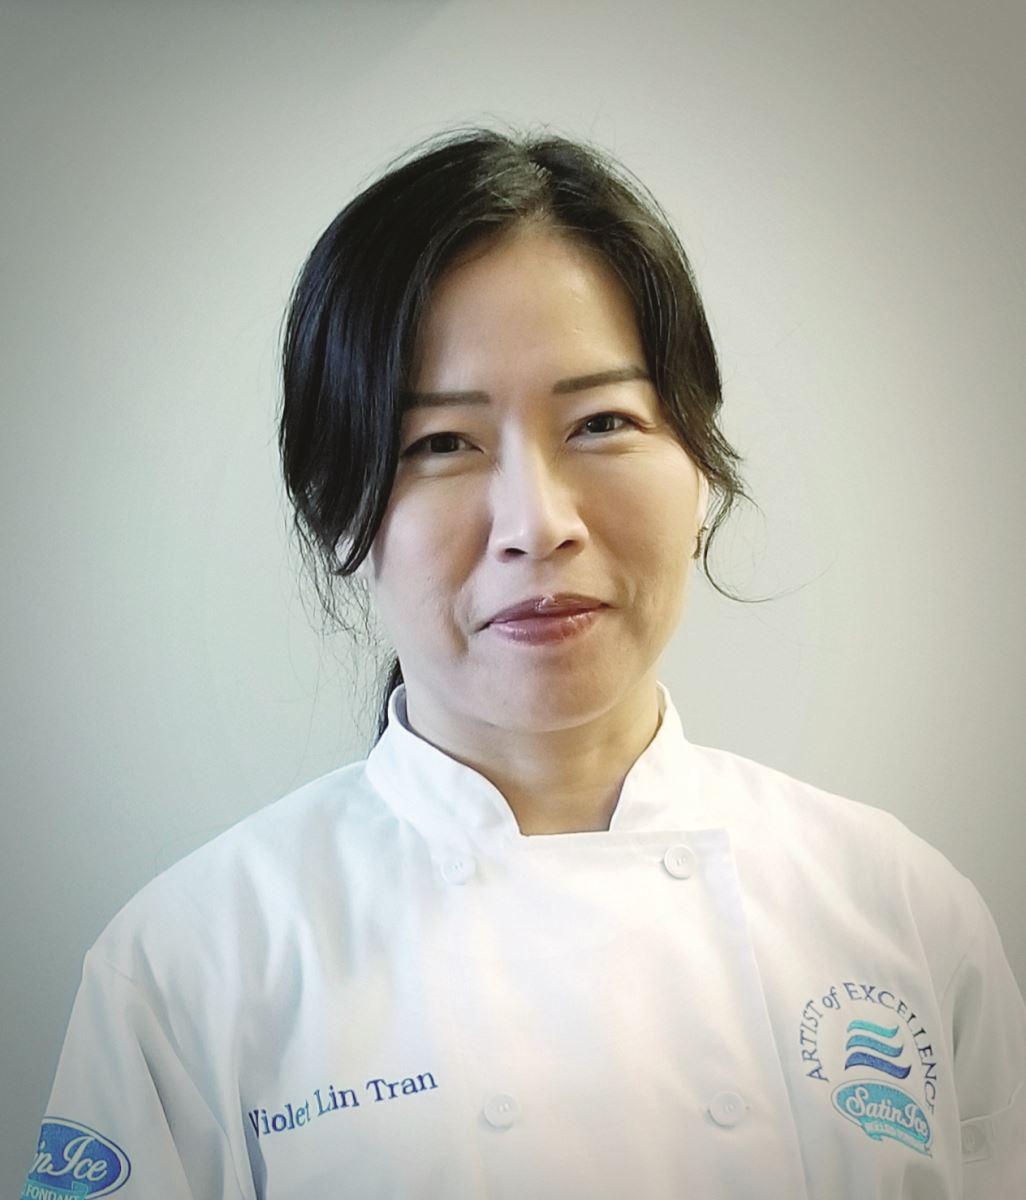 Violet Lin Tran: Cake designer and Satin Ice Artist of Excellence